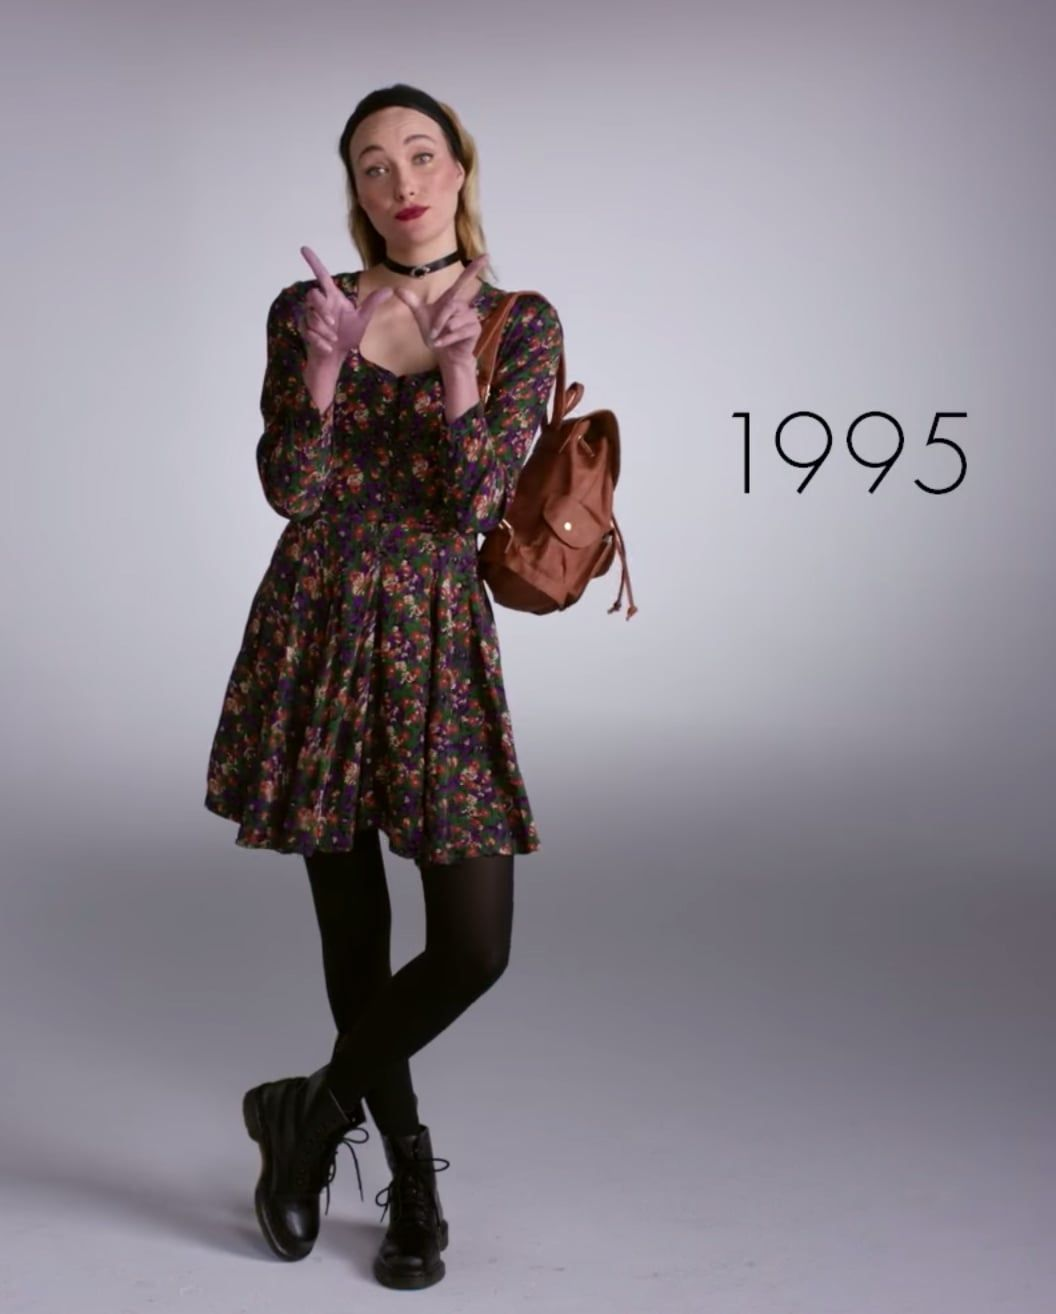 1995 | 1990s fashion trends, 90s fashion trending, 1990s fashion